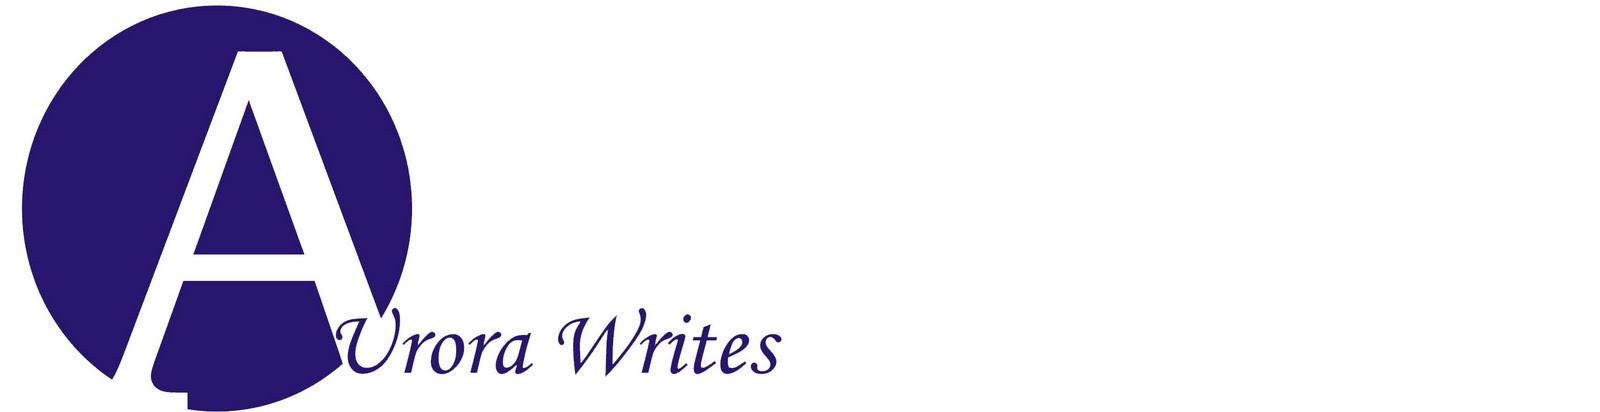 Aurora Writes